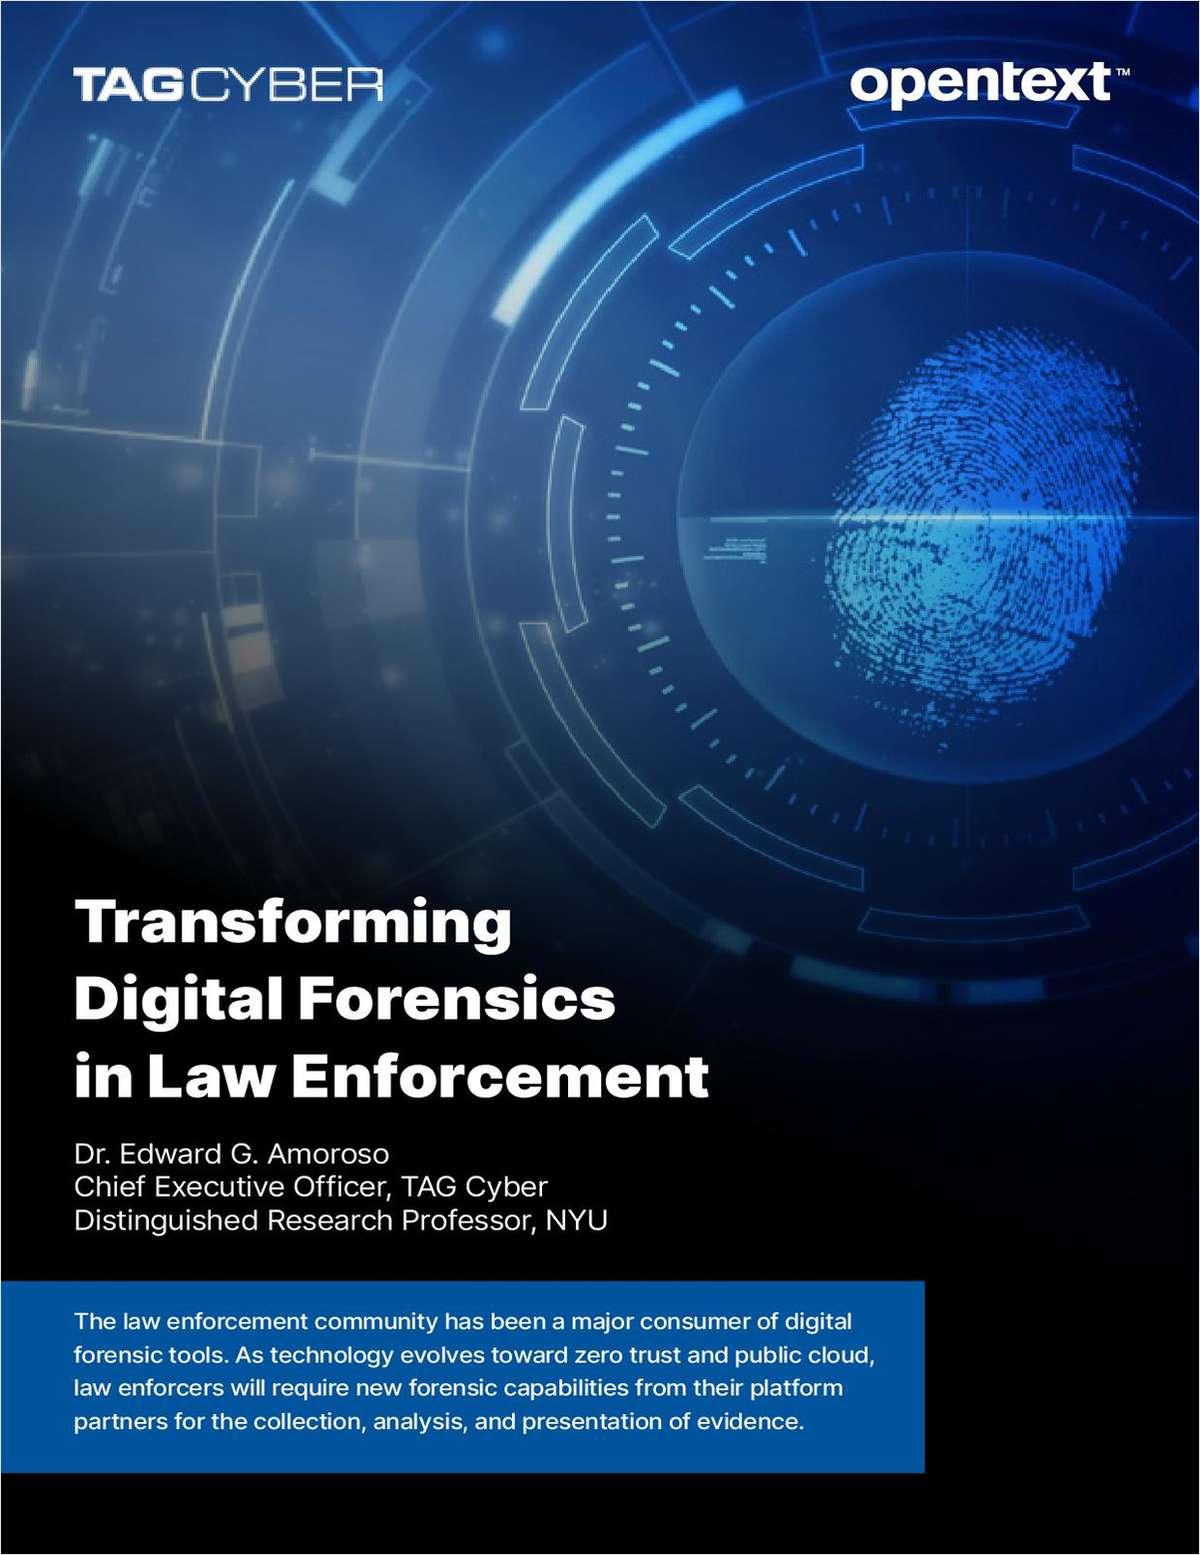 Transforming Digital Forensics in Law Enforcement